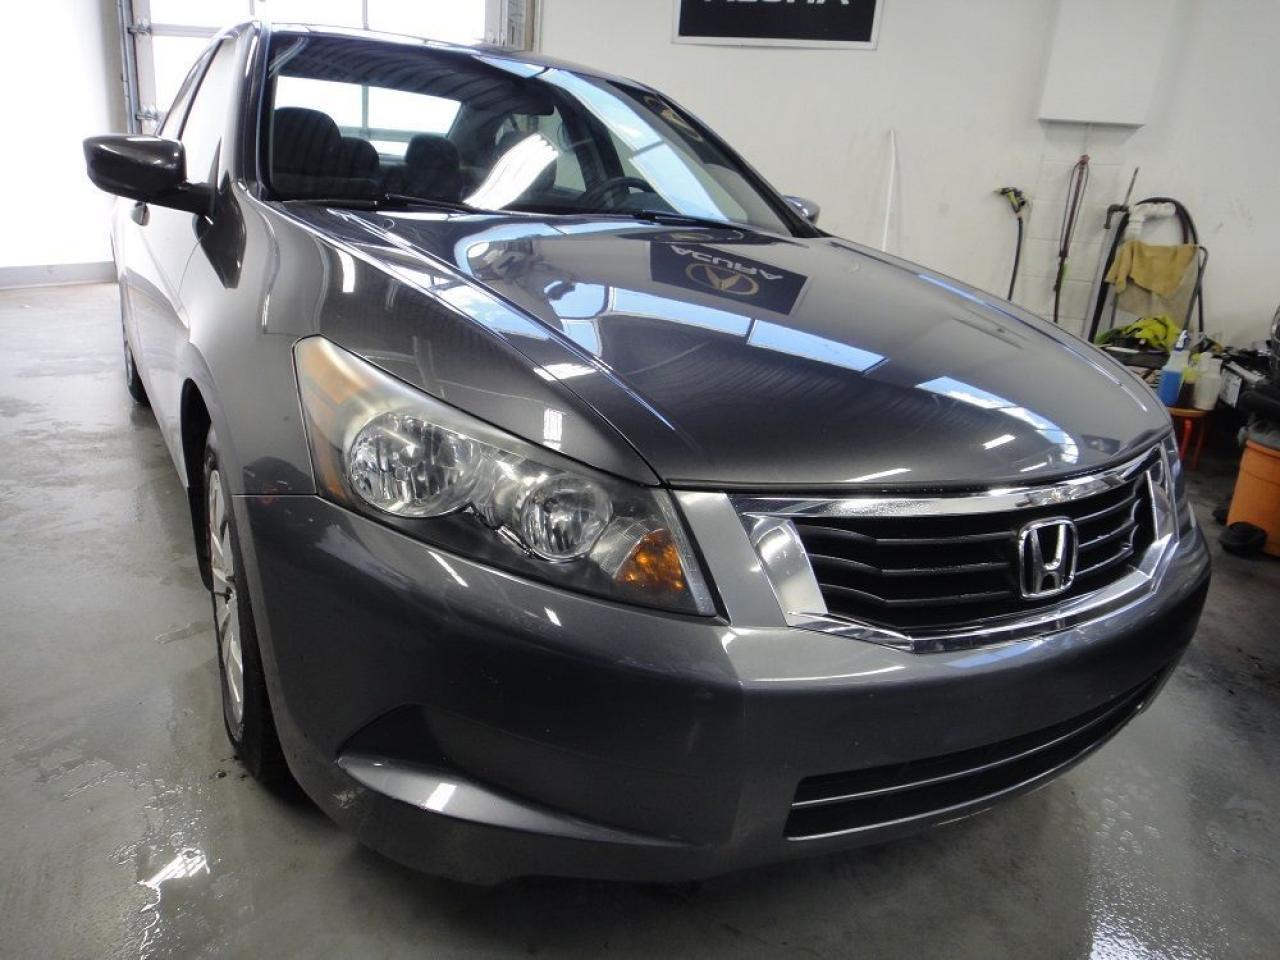 2010 Honda Accord LX MODEL,4 CYL,VERY CLEAN 0 CLAIM